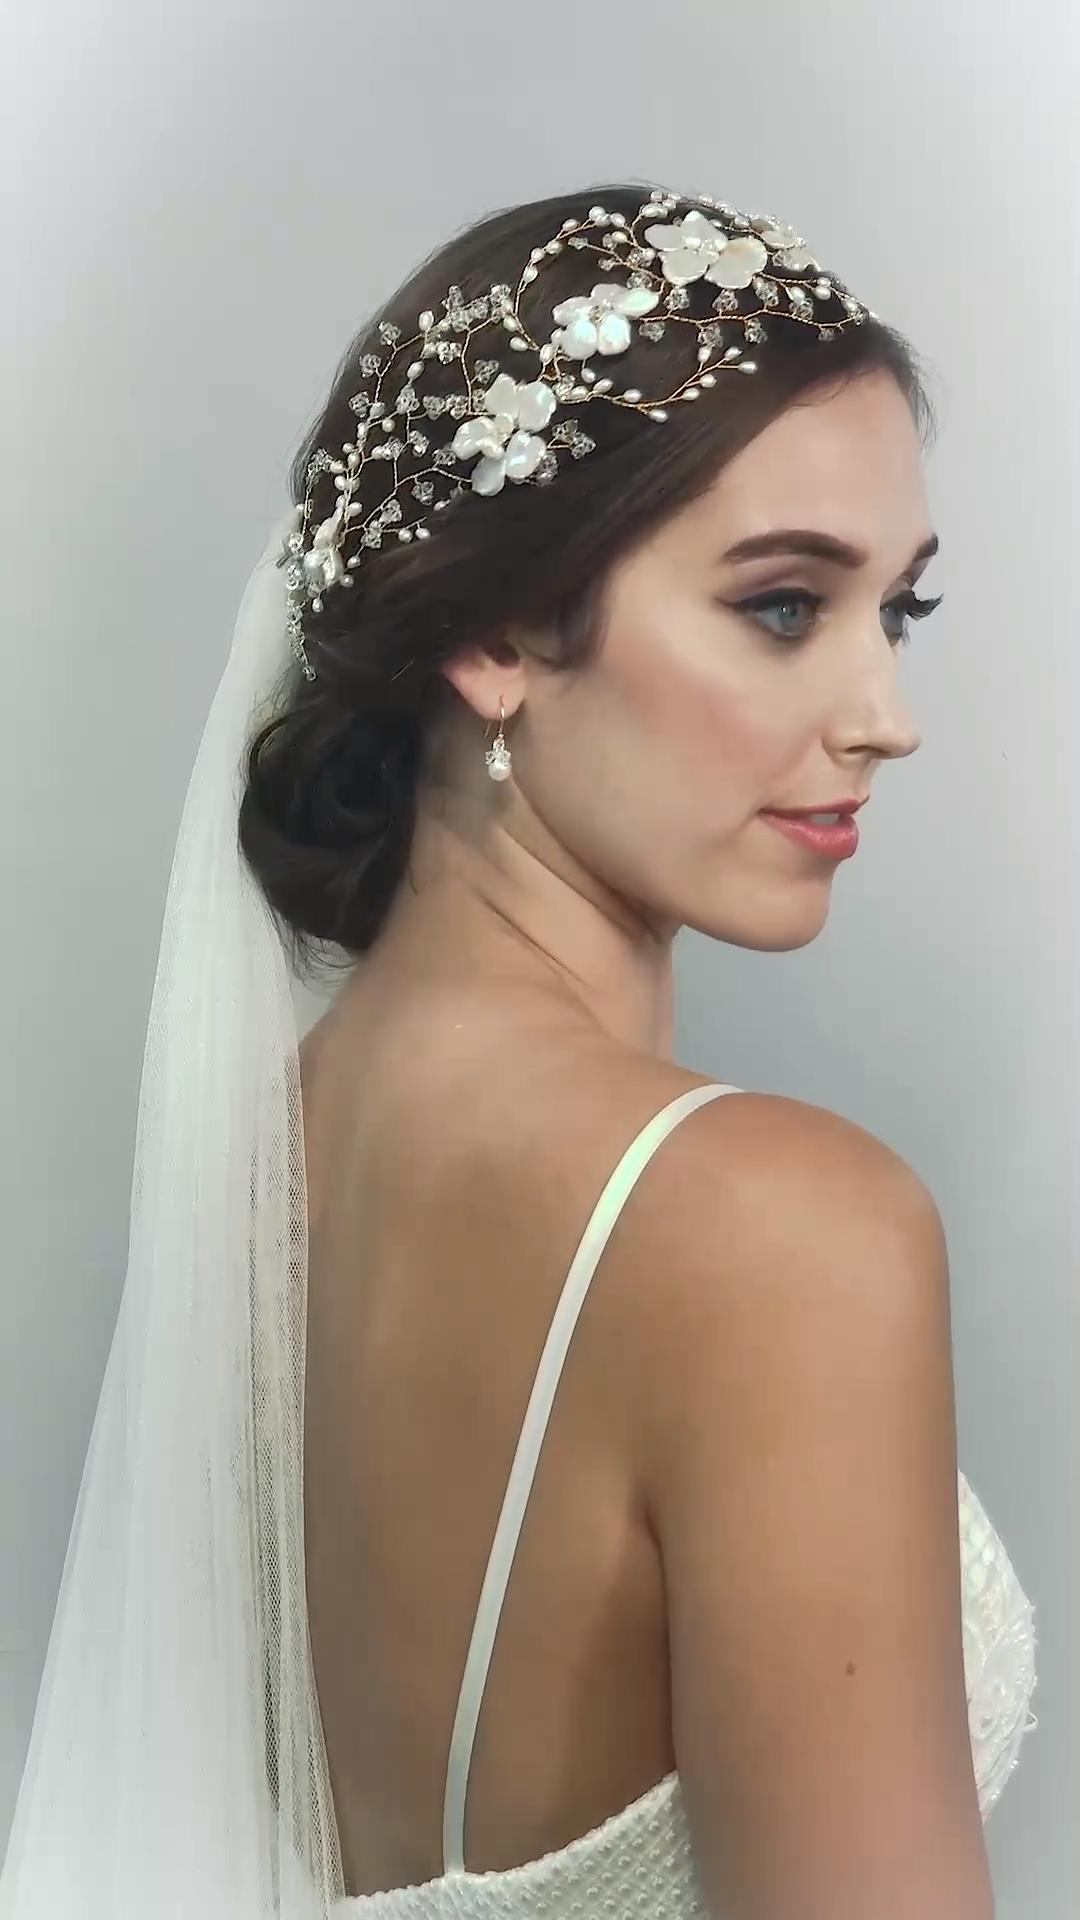 MAY BLOSSOM HEADDRESS AND VEIL-wedding accessories, flower crown, wedding accessories + veil #bridalheadpieces